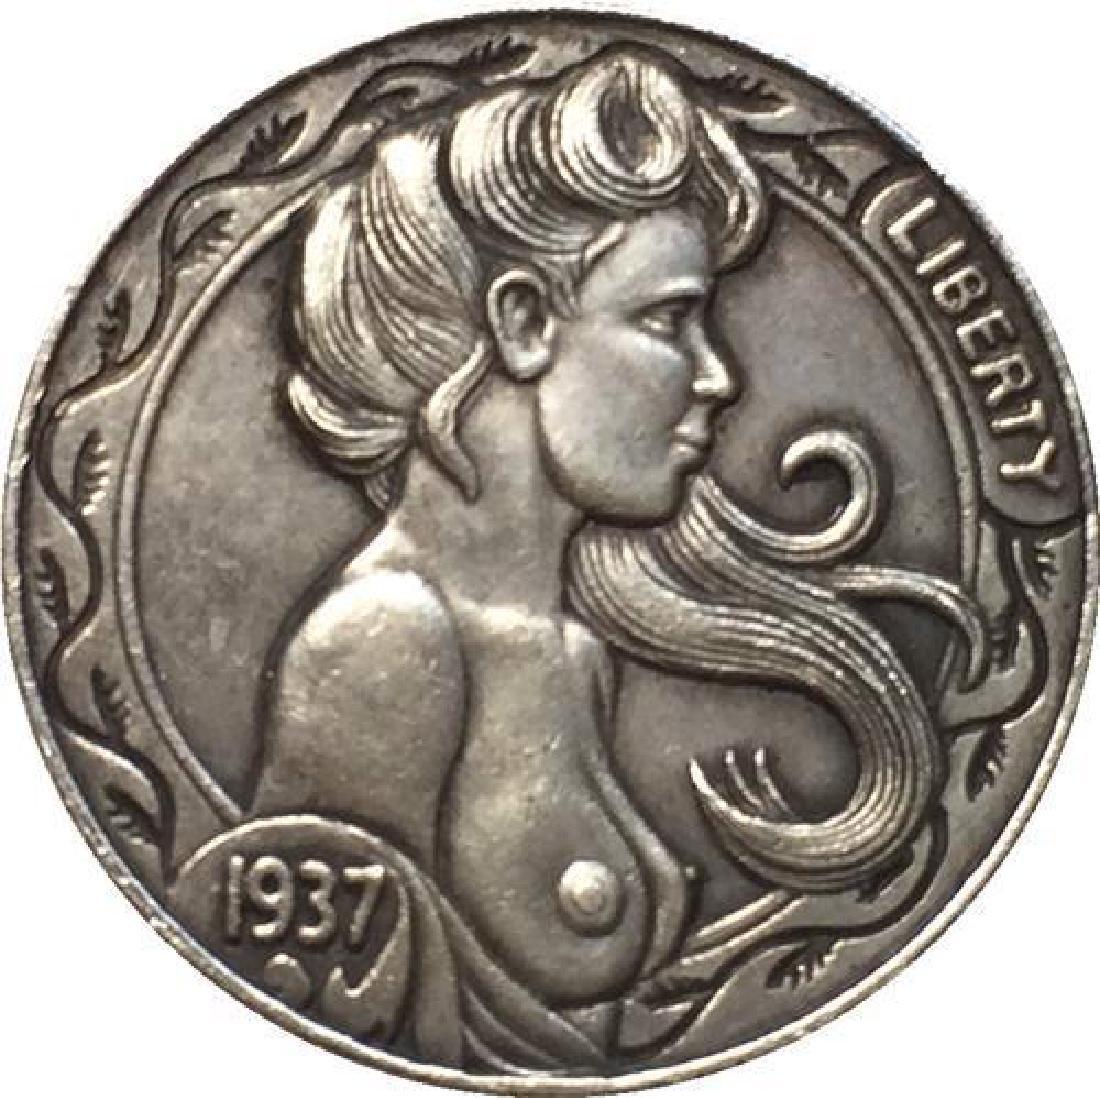 1937 USA Topless Woman Buffalo Coin